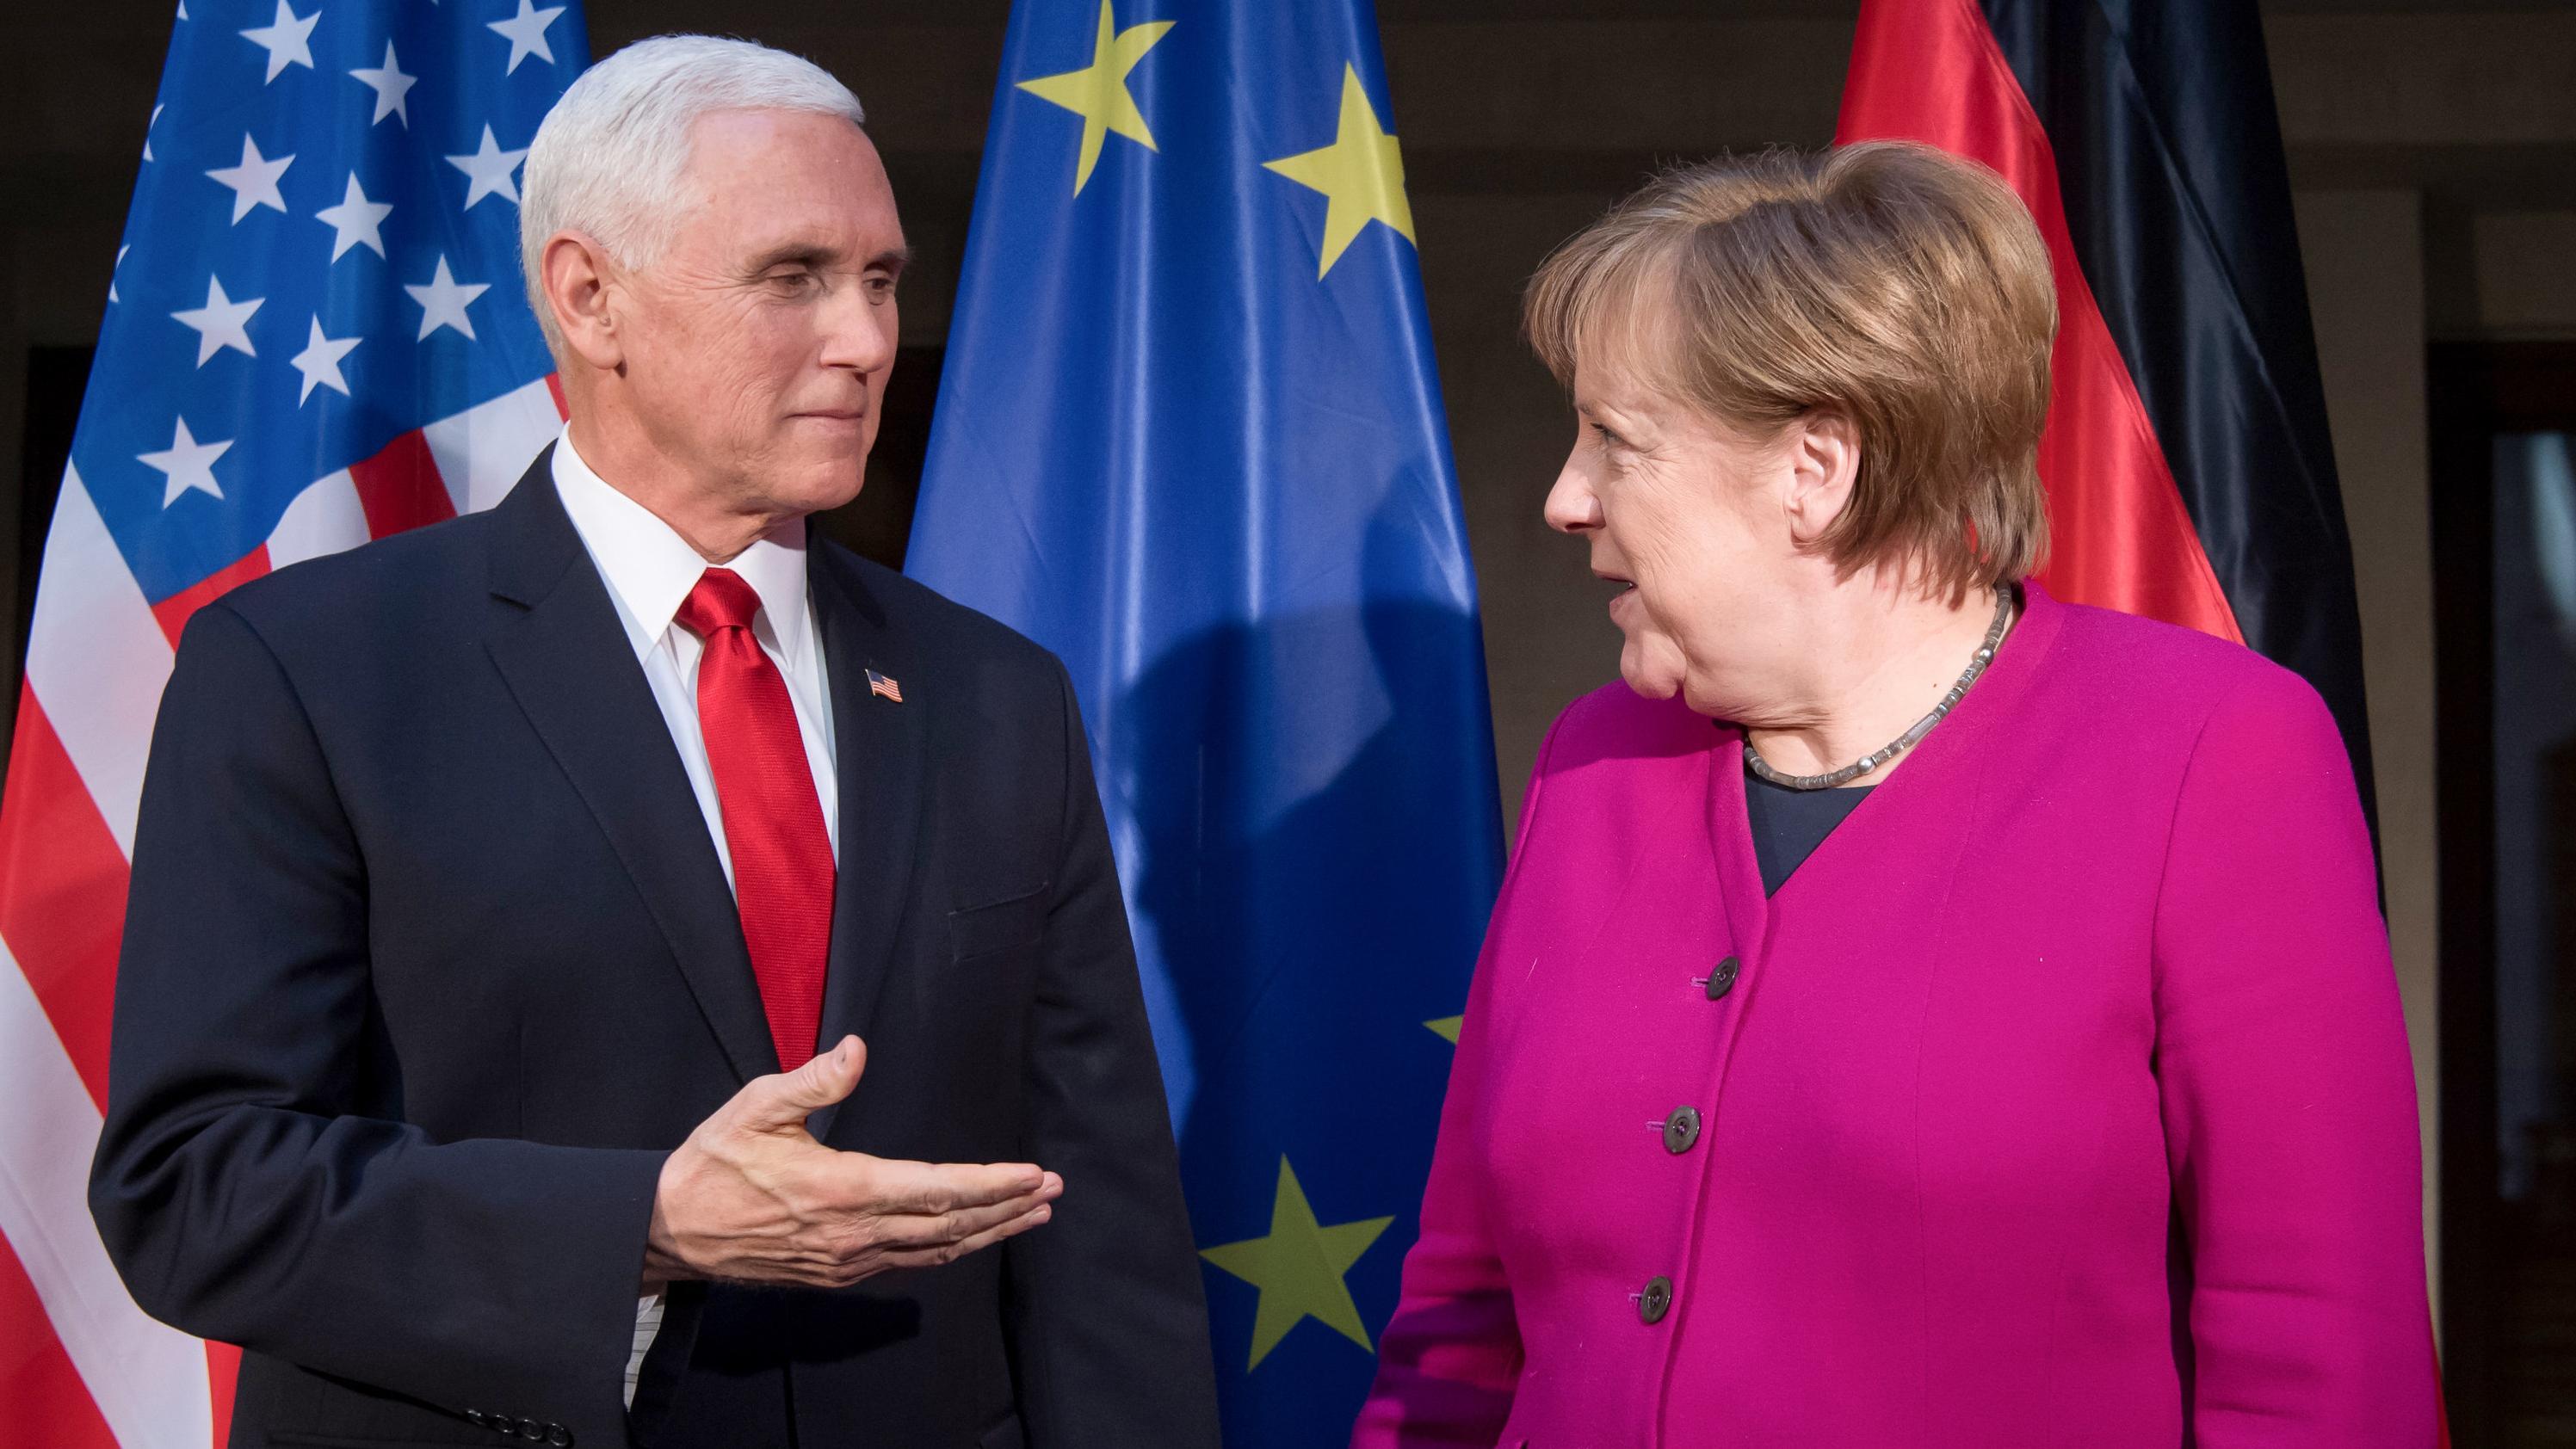 Bundeskanzlerin Angela Merkel und US-Vizepräsident Mike Pence